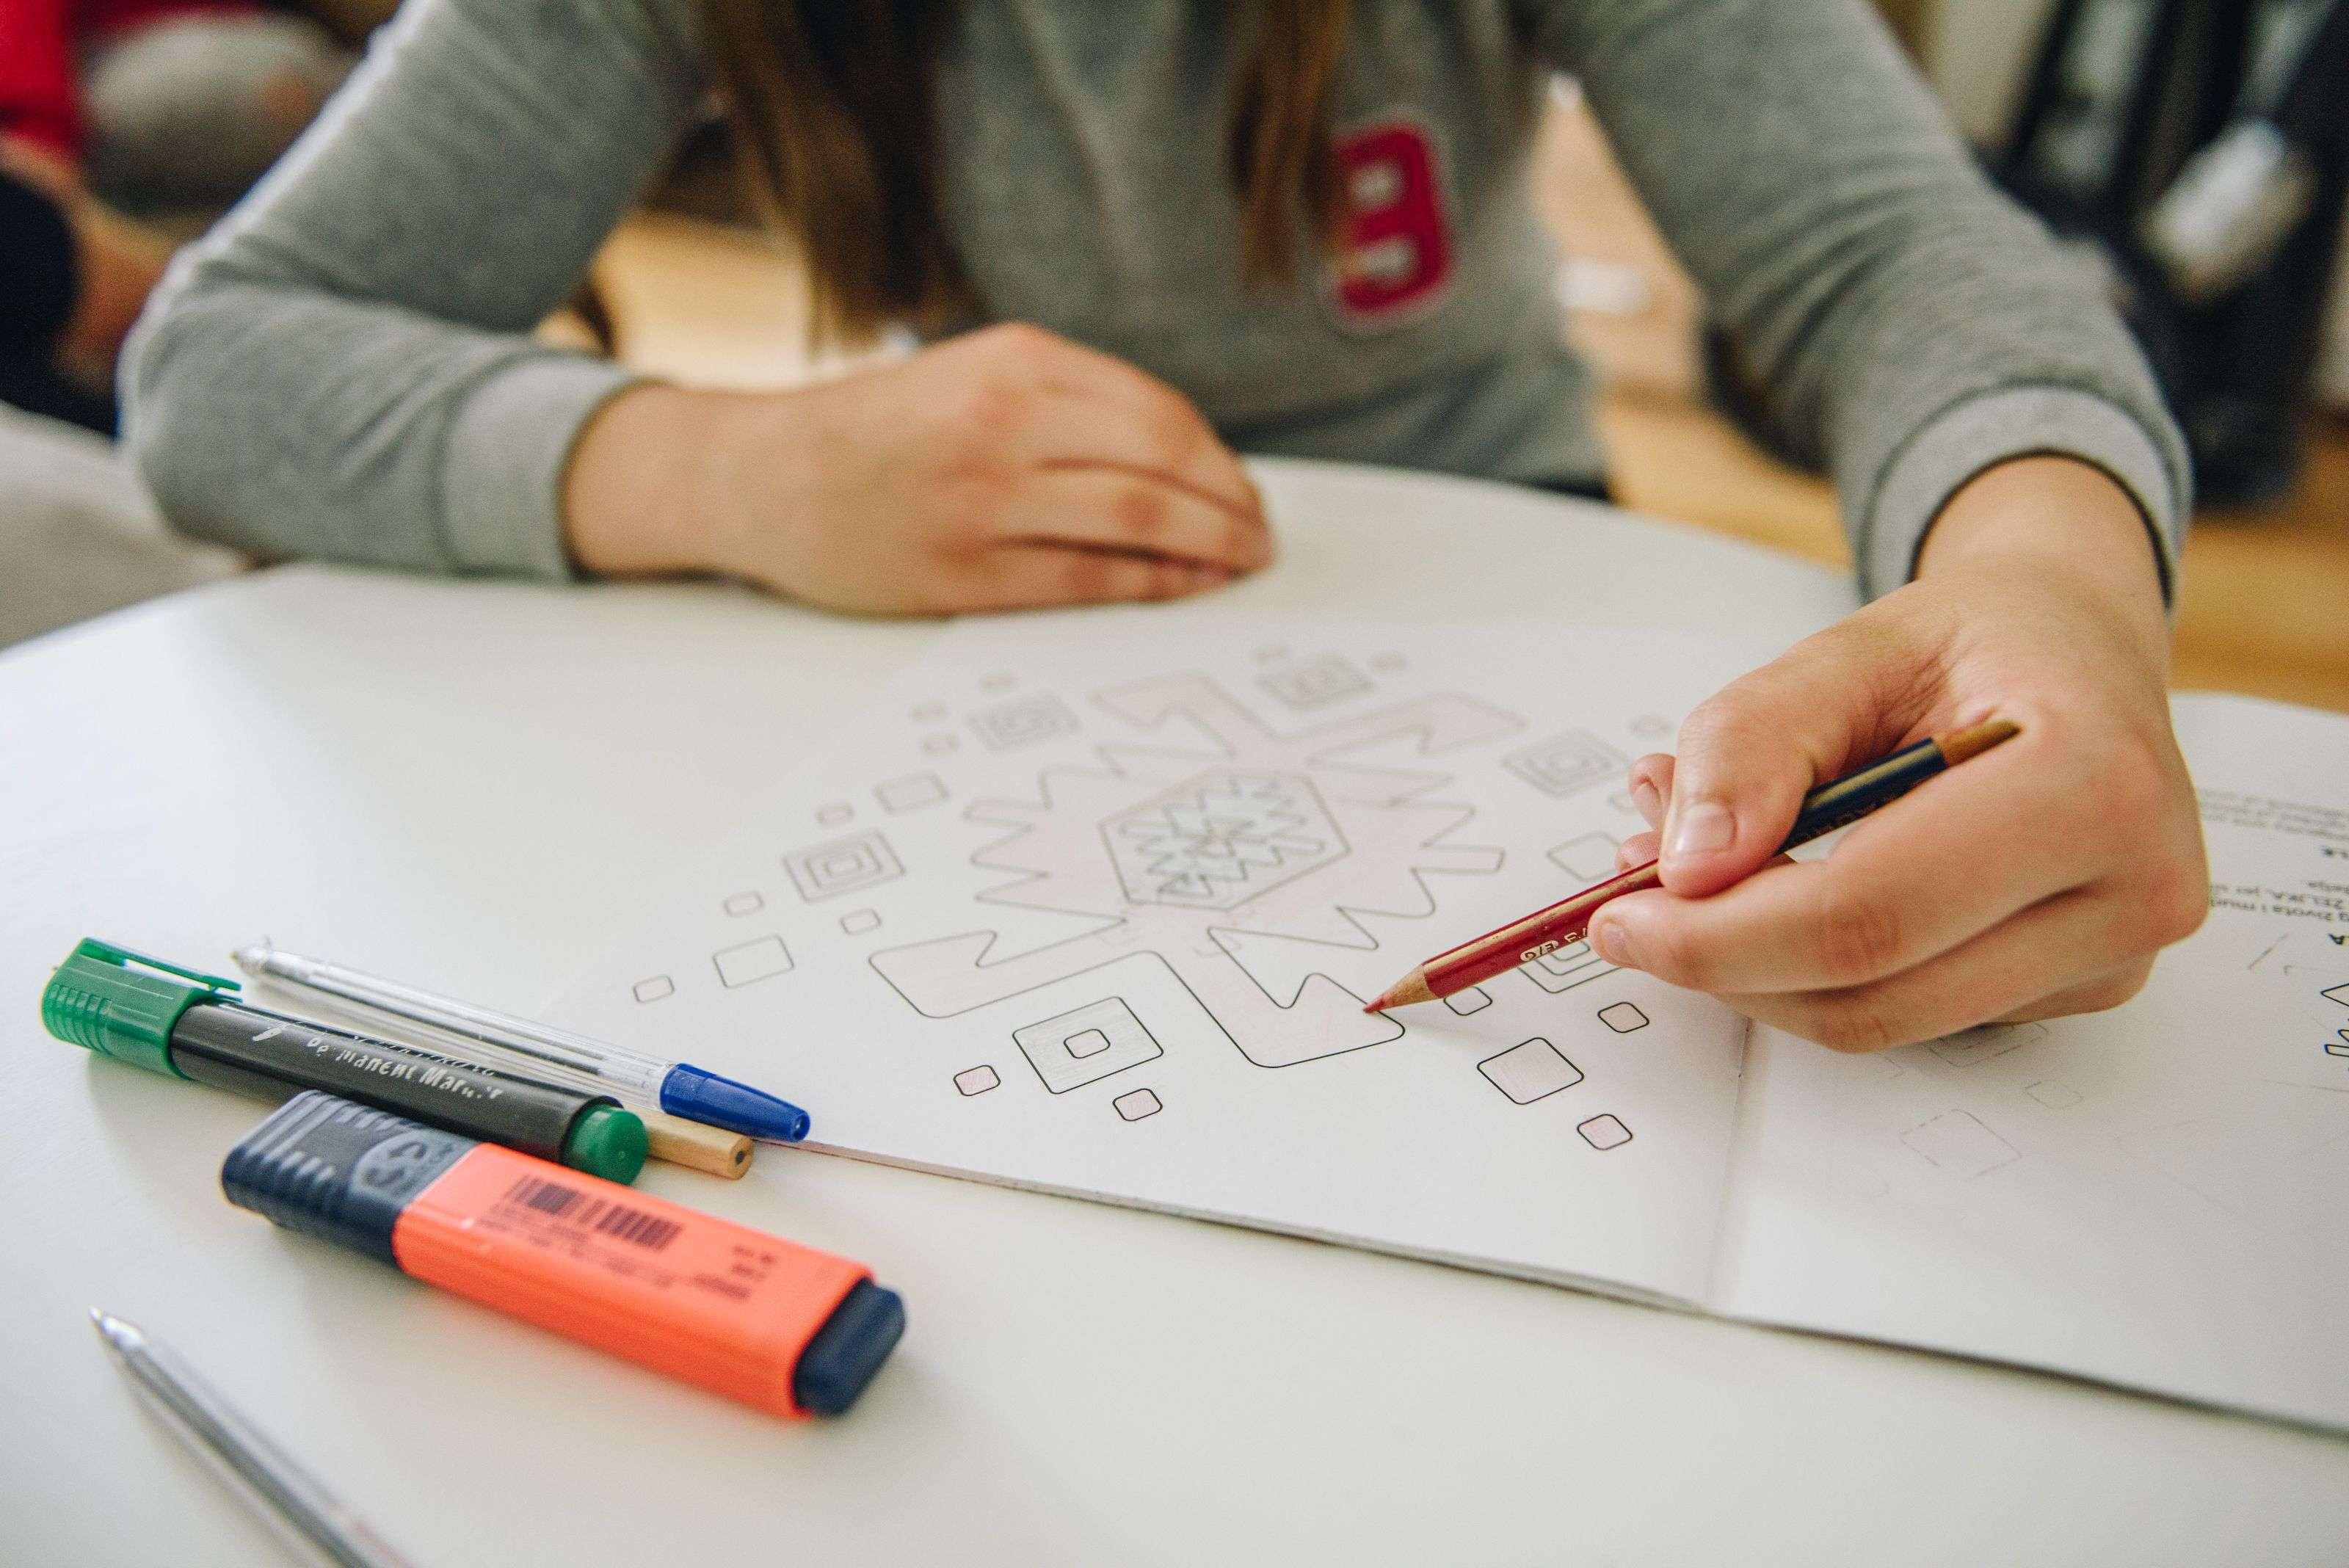 Predškolsko obrazovanje u Bosni i Hercegovini - Pravo ili privilegija